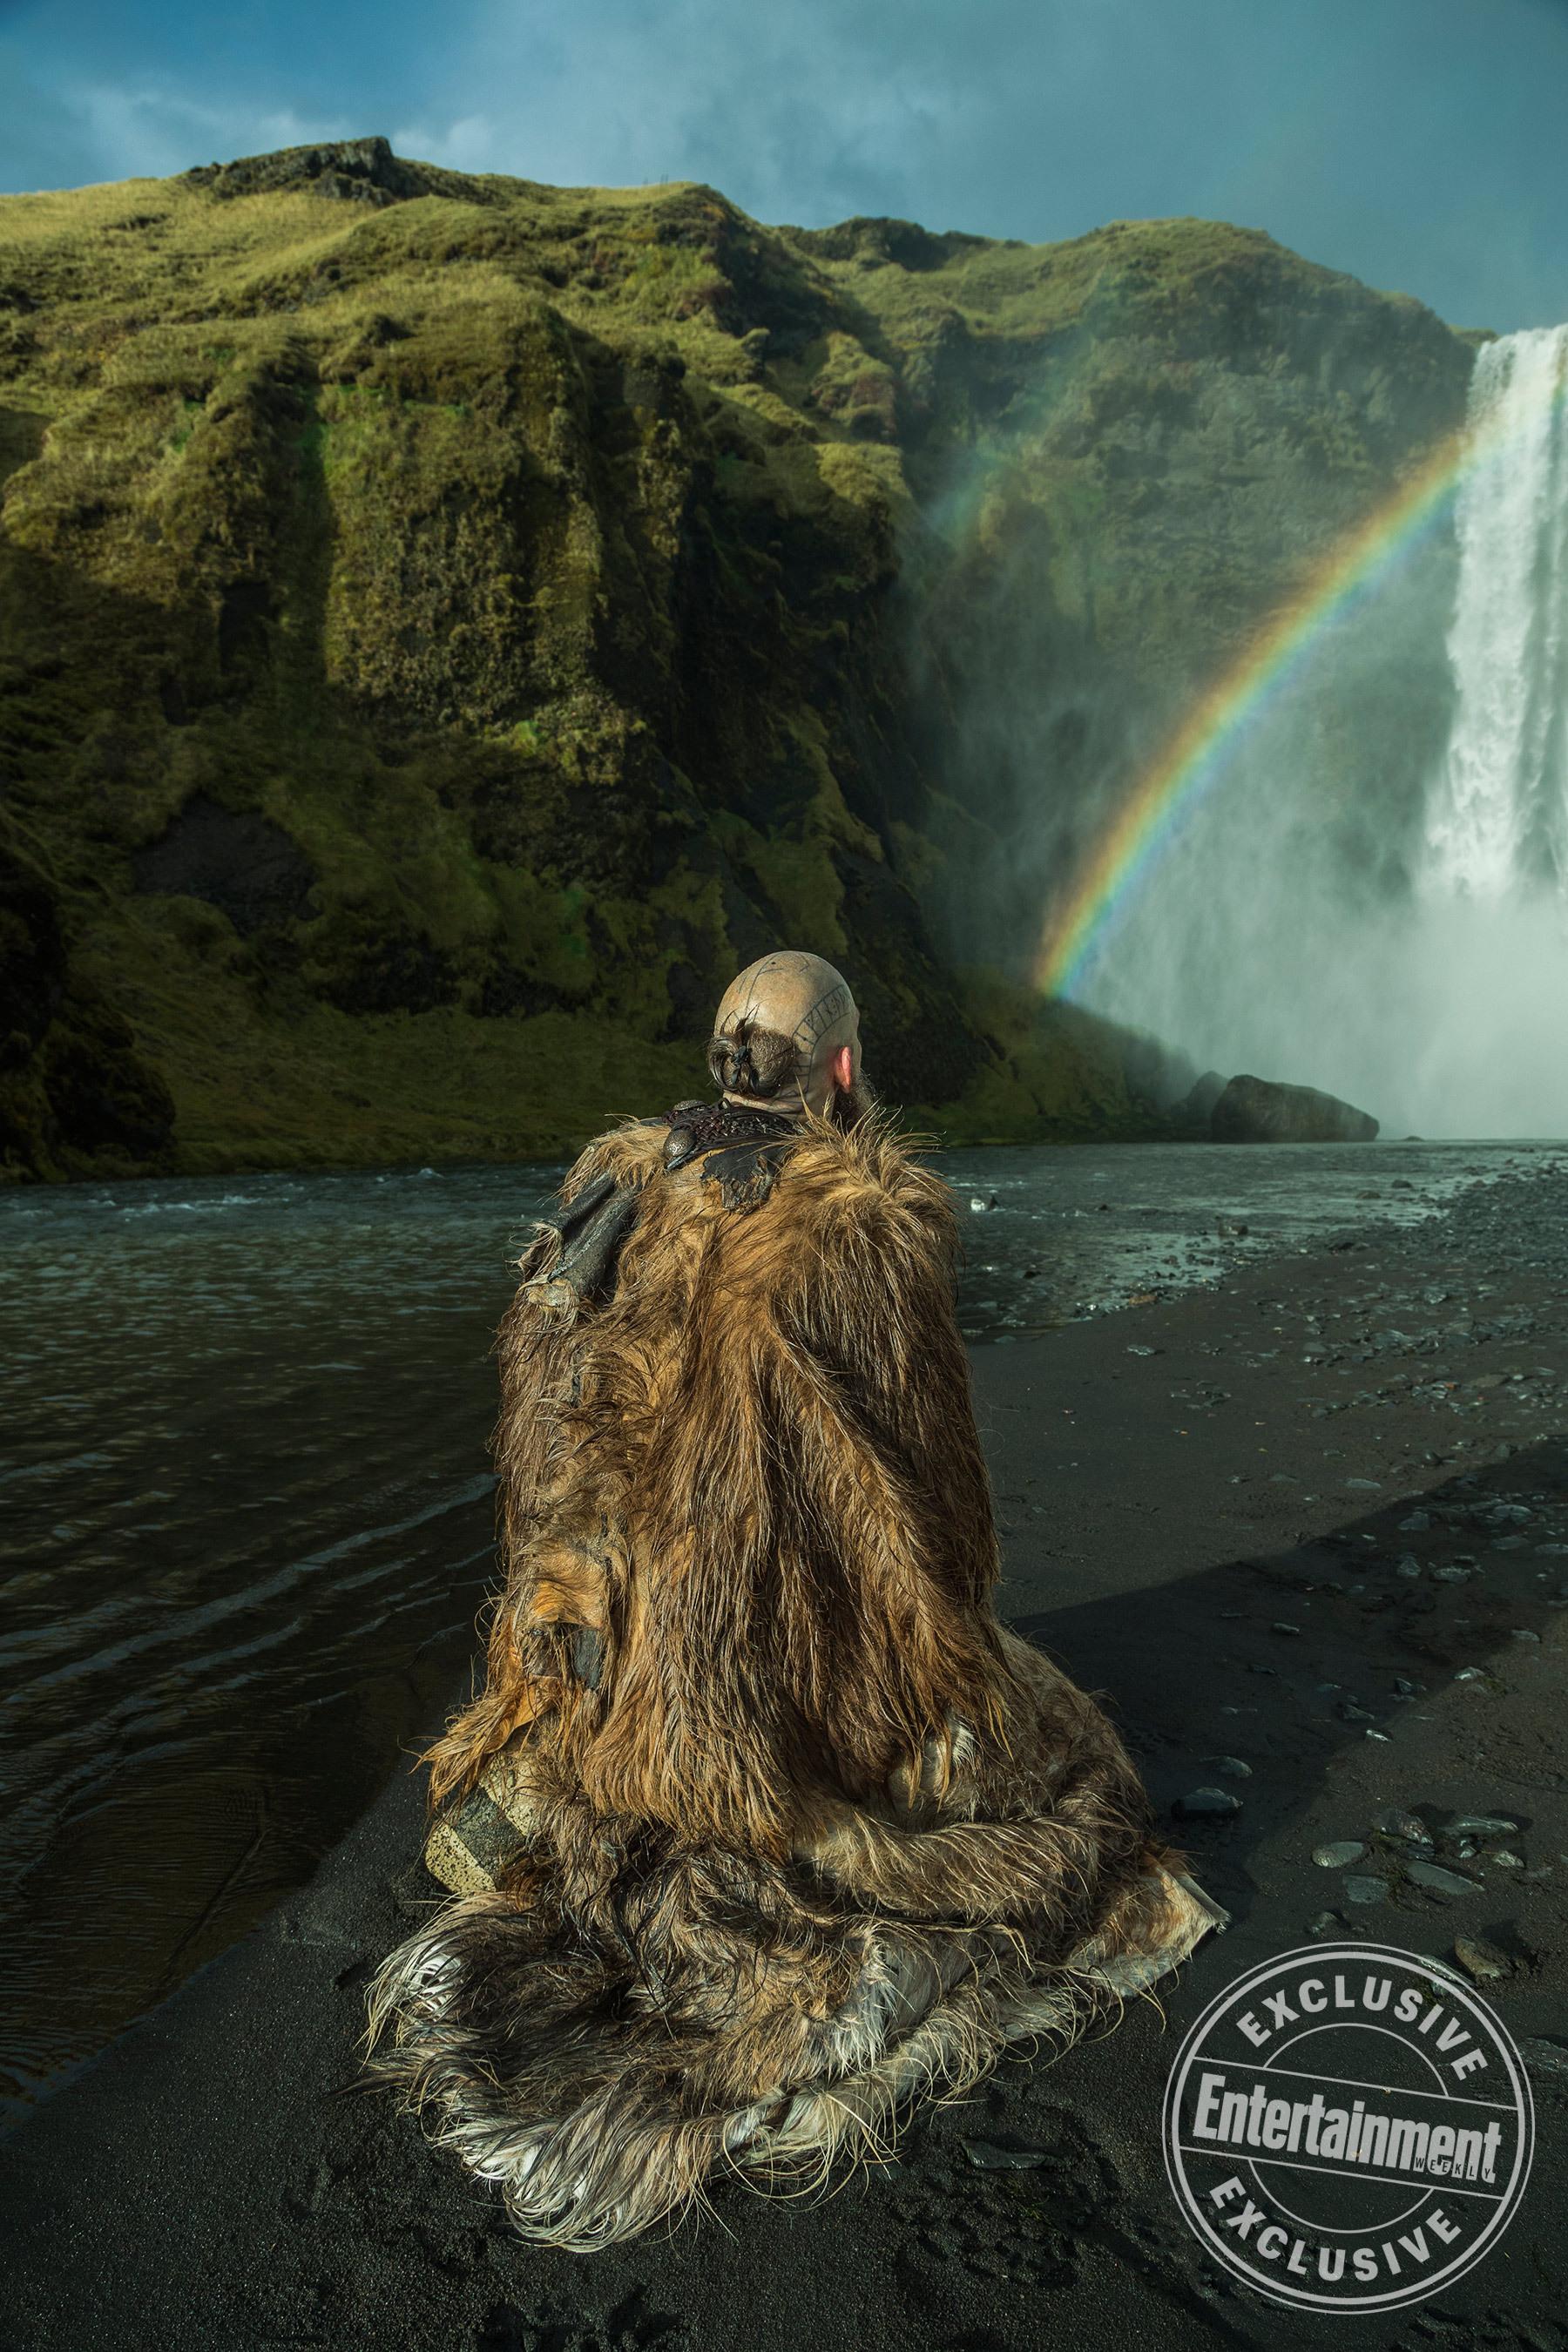 Vikings Tv Series Images Vikings Season 5 First Look Hd Wallpaper